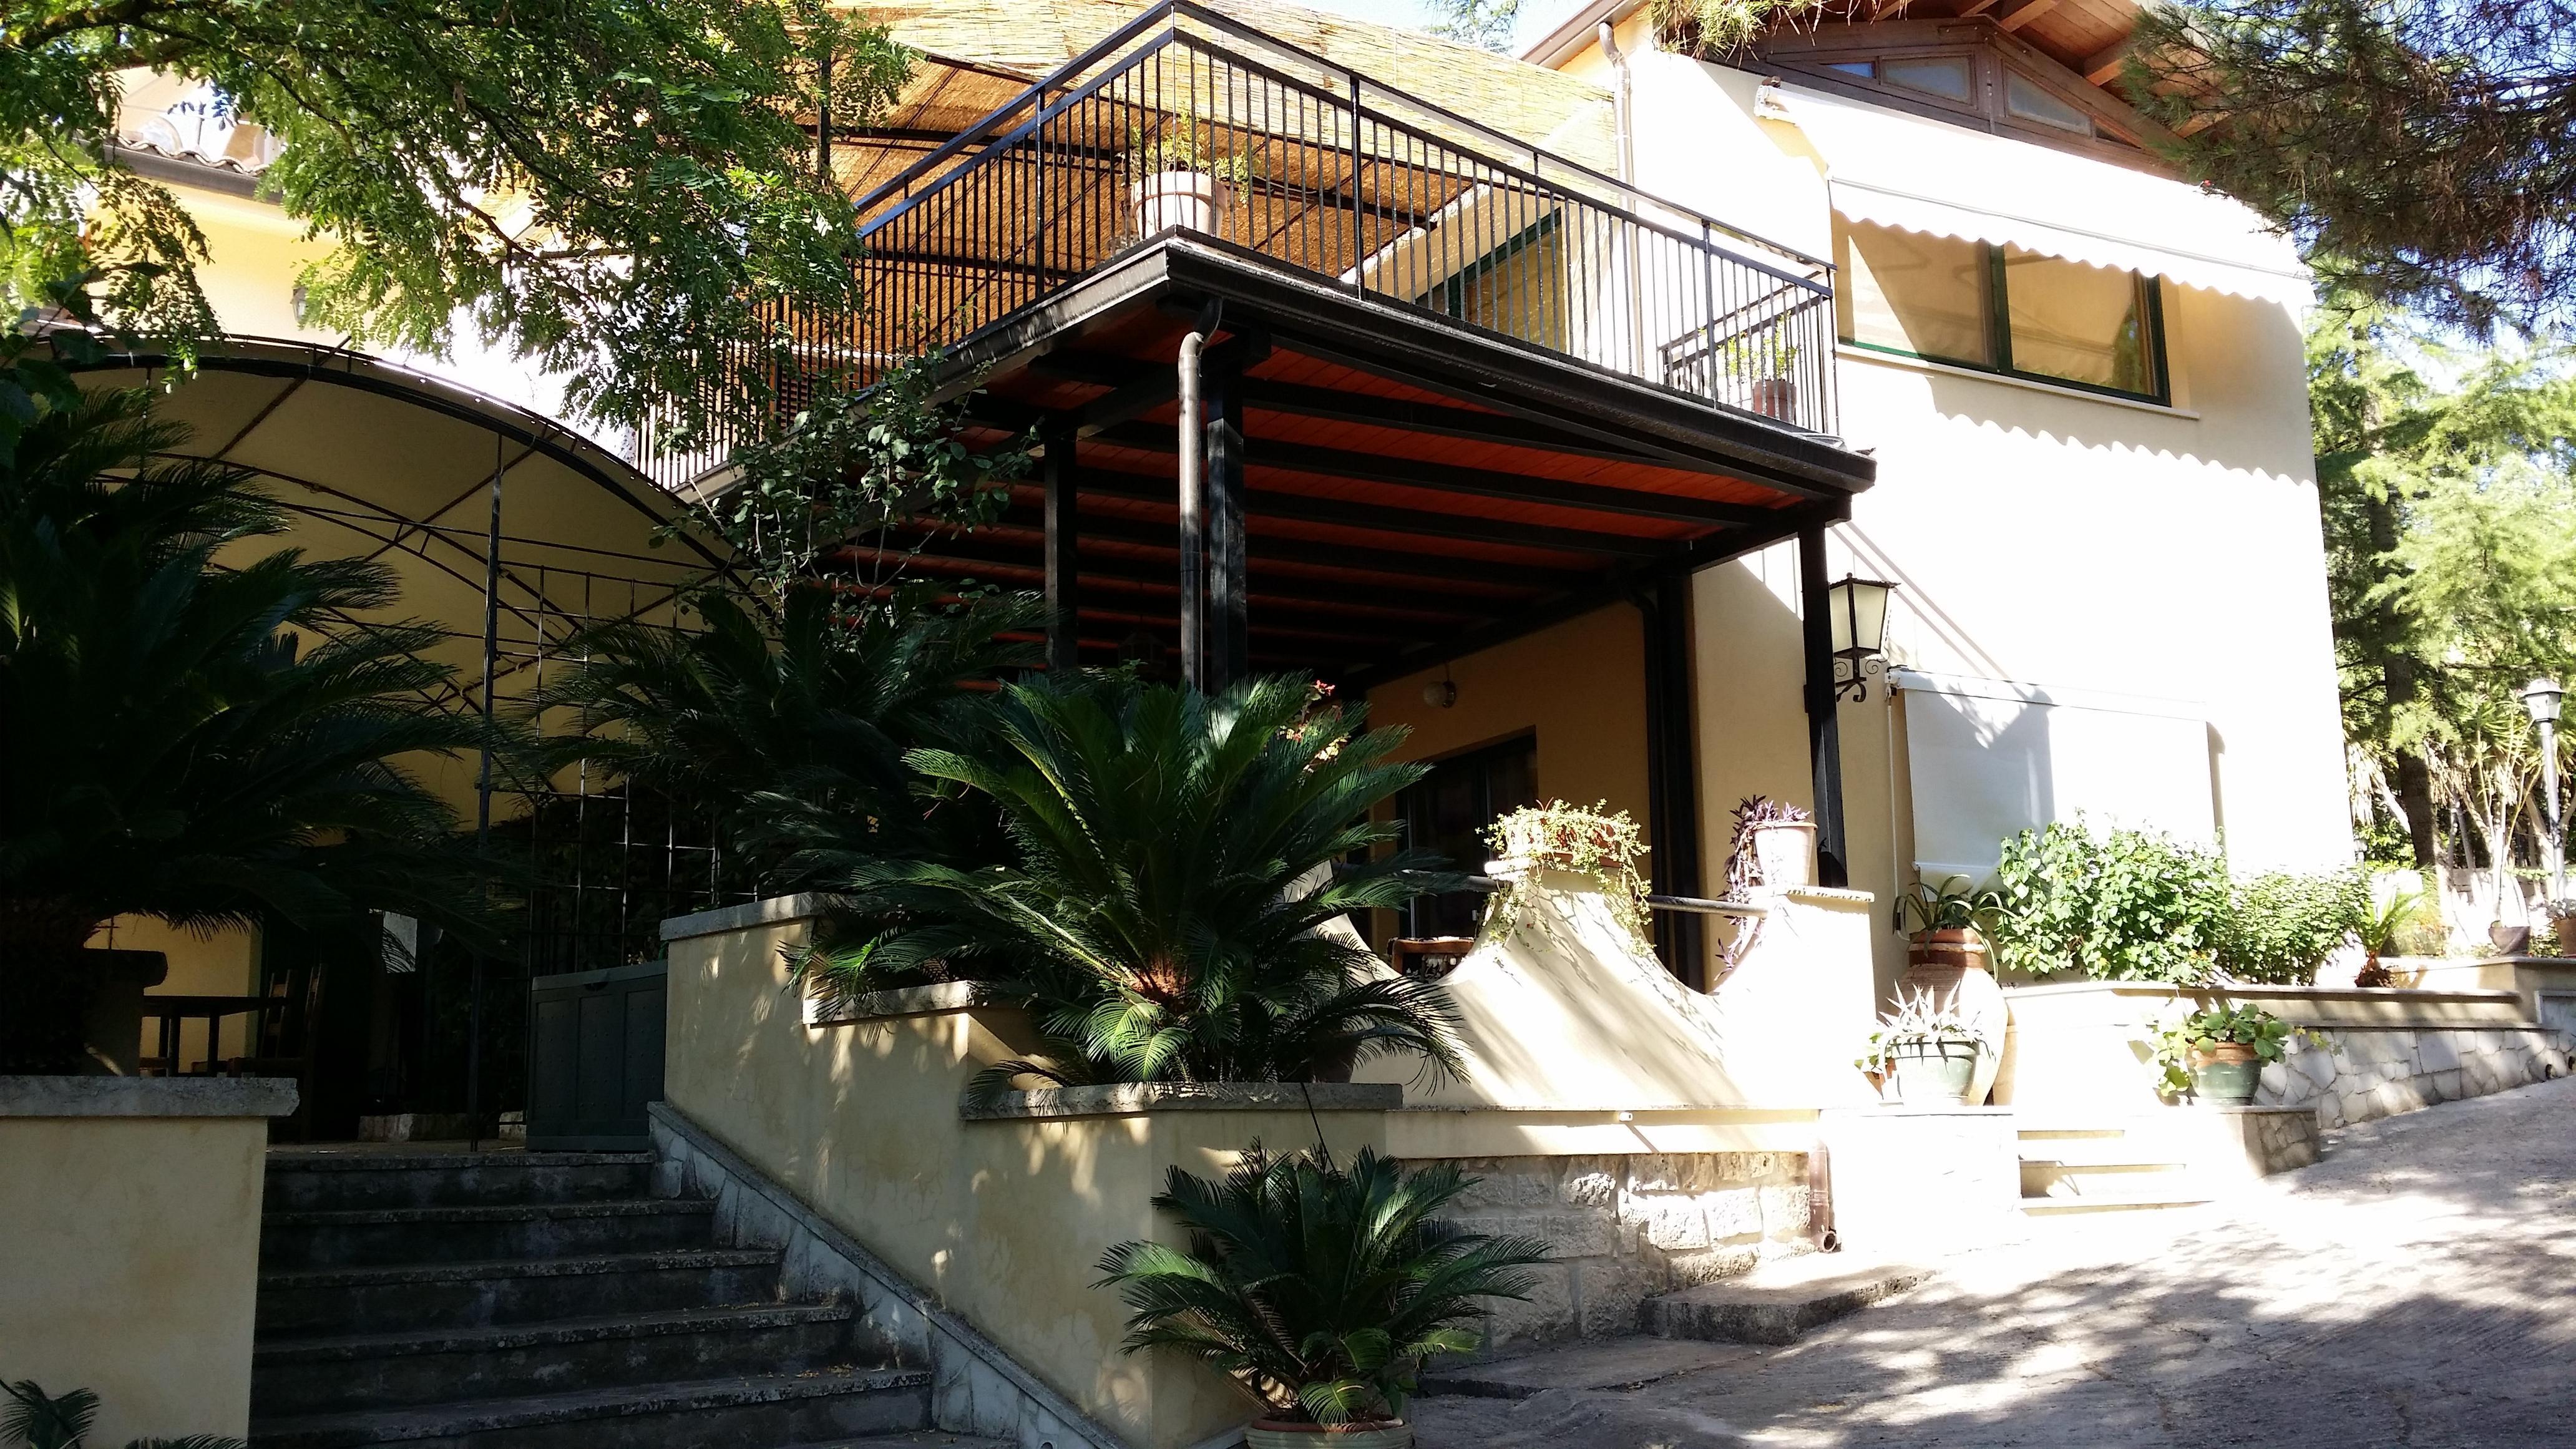 Appartement de vacances Carrubo (1730191), Modica, Ragusa, Sicile, Italie, image 17